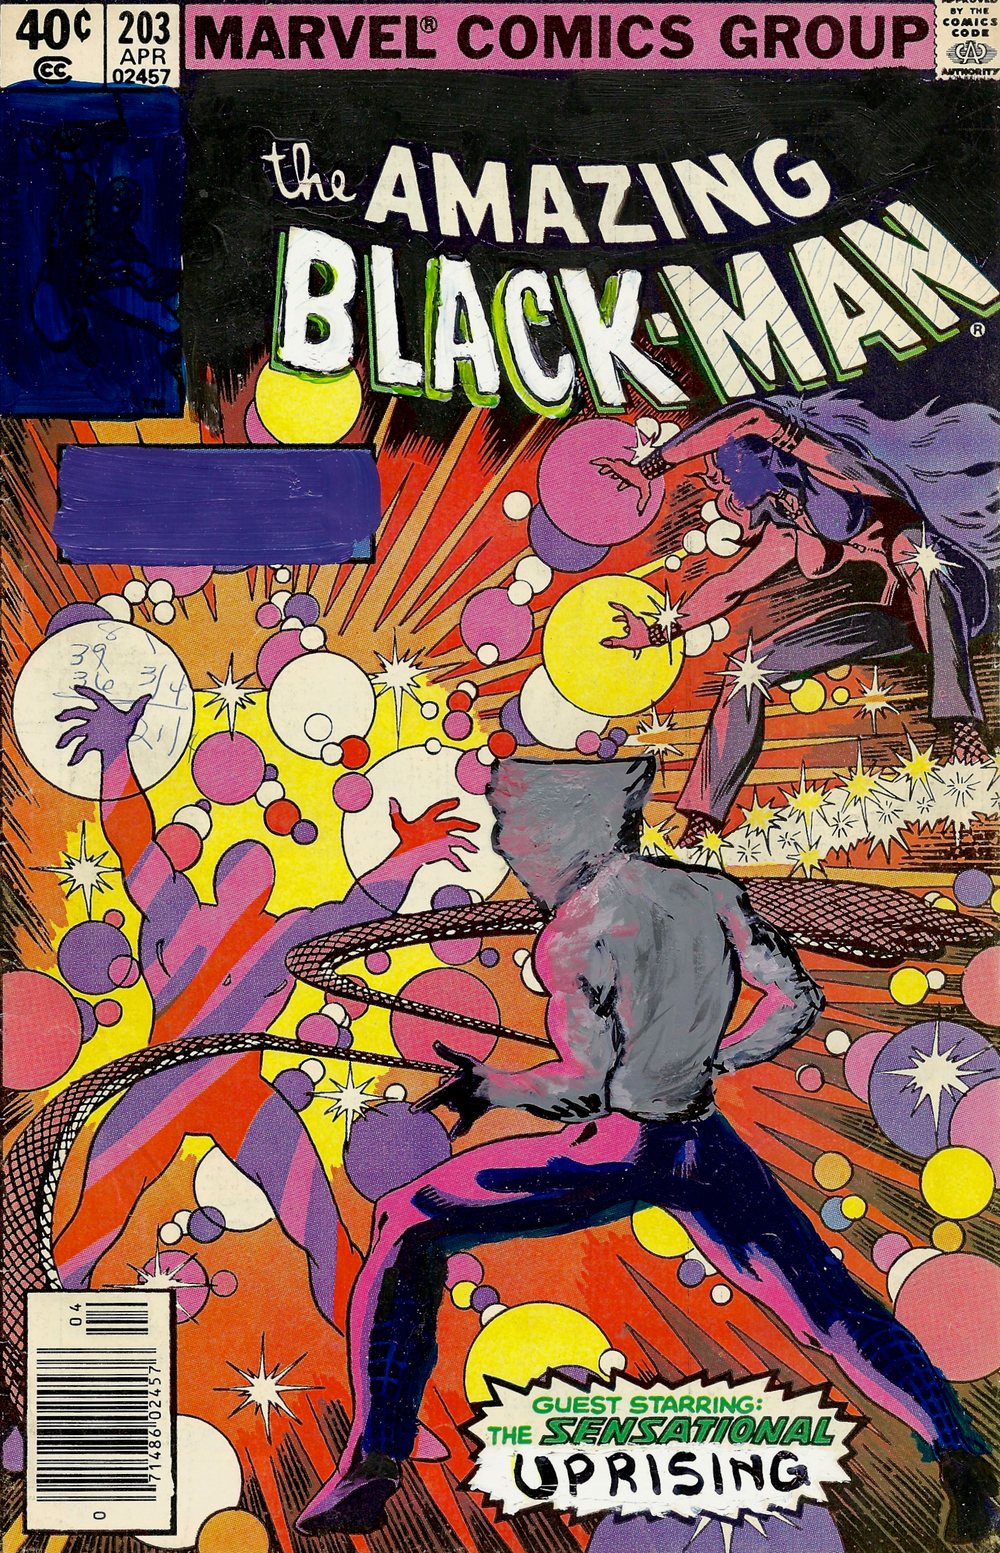 The Amazing Black-Man #203